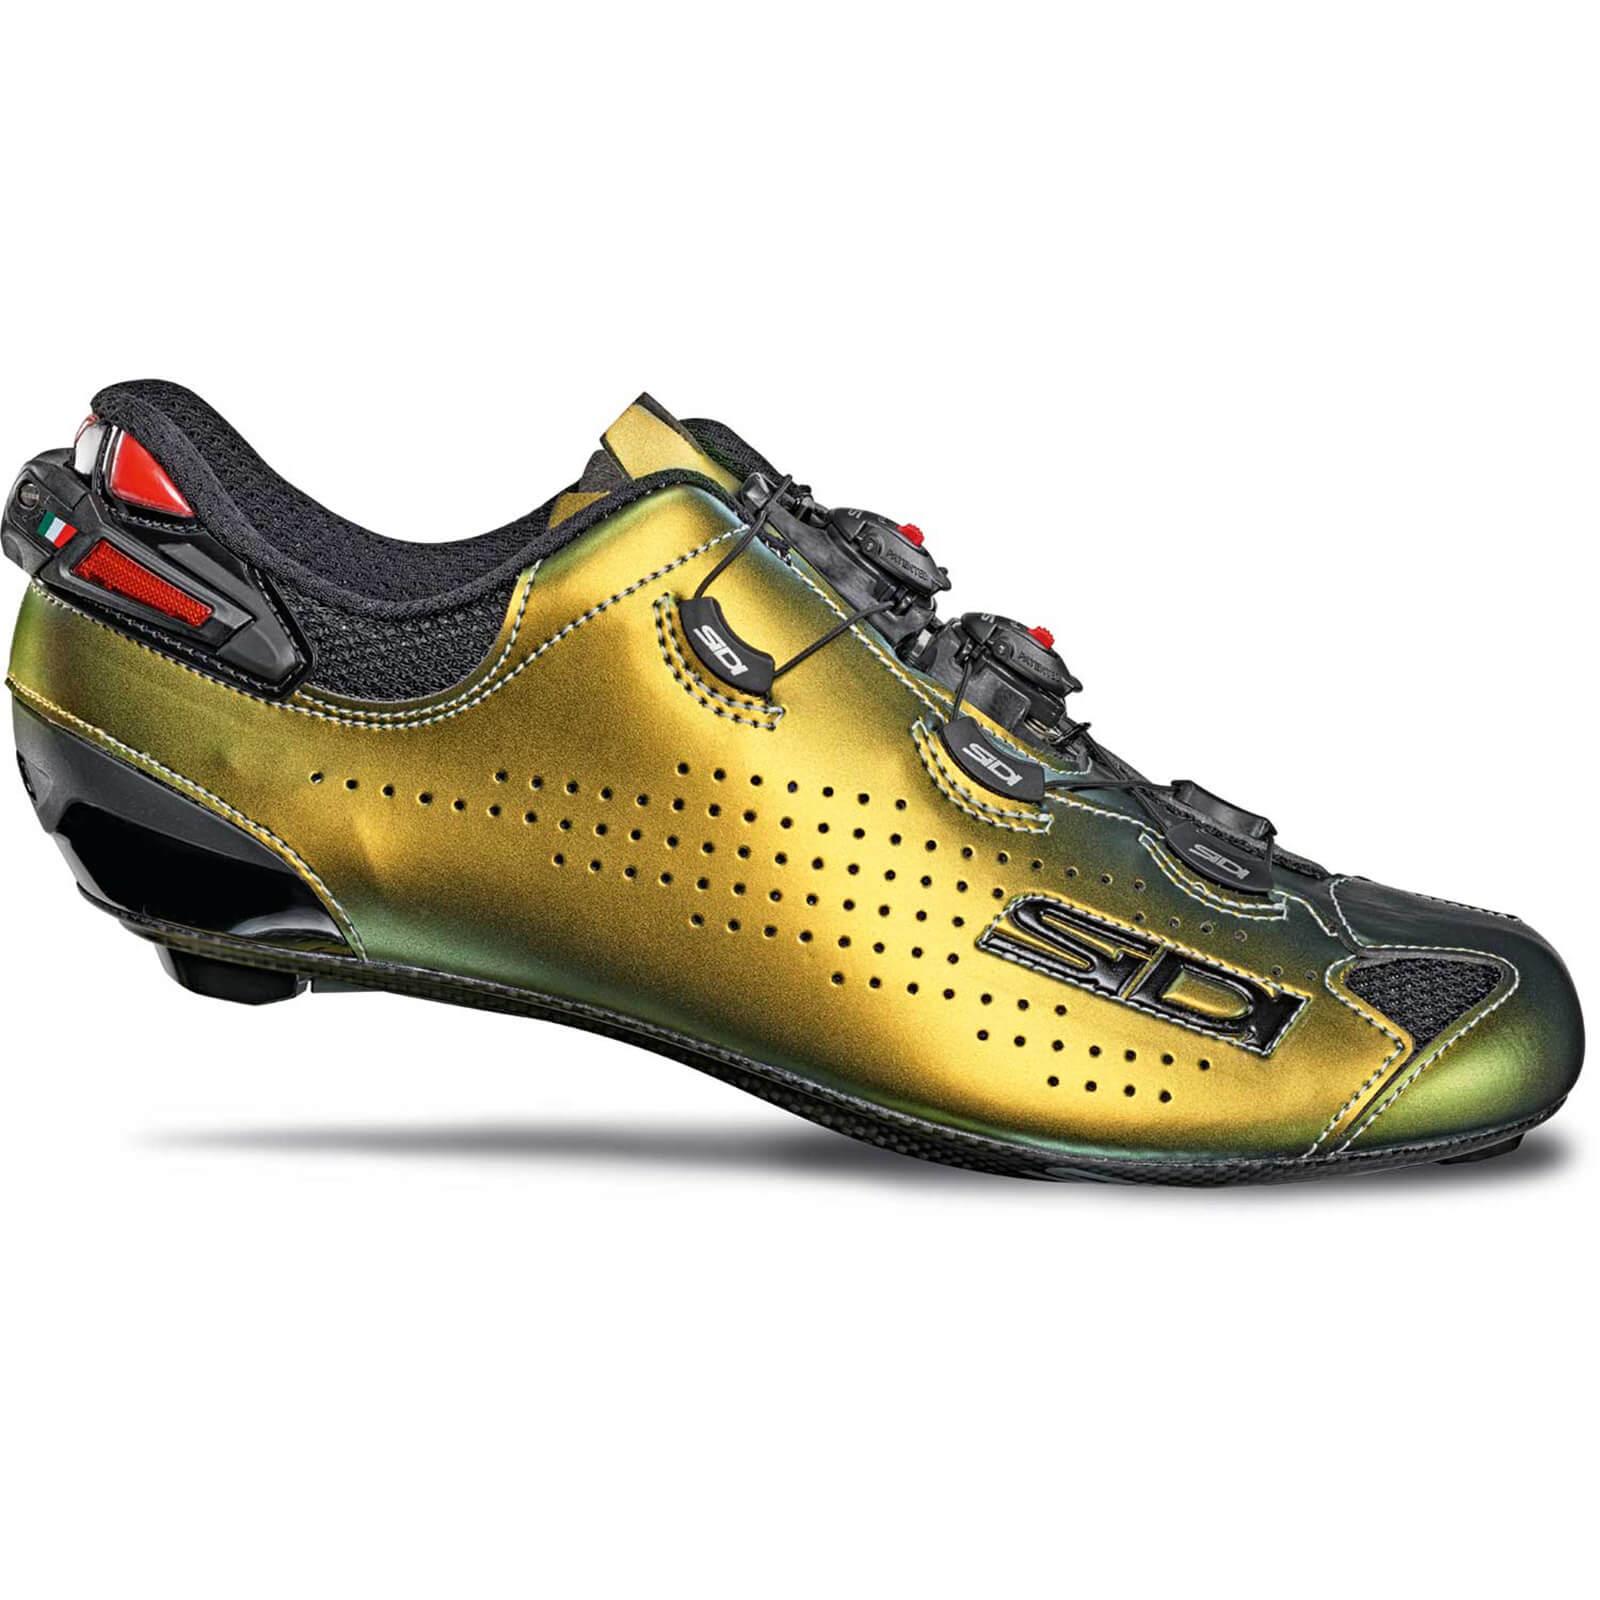 Sidi Shot 2 Limited Edition Carbon Road Shoes - EU 42